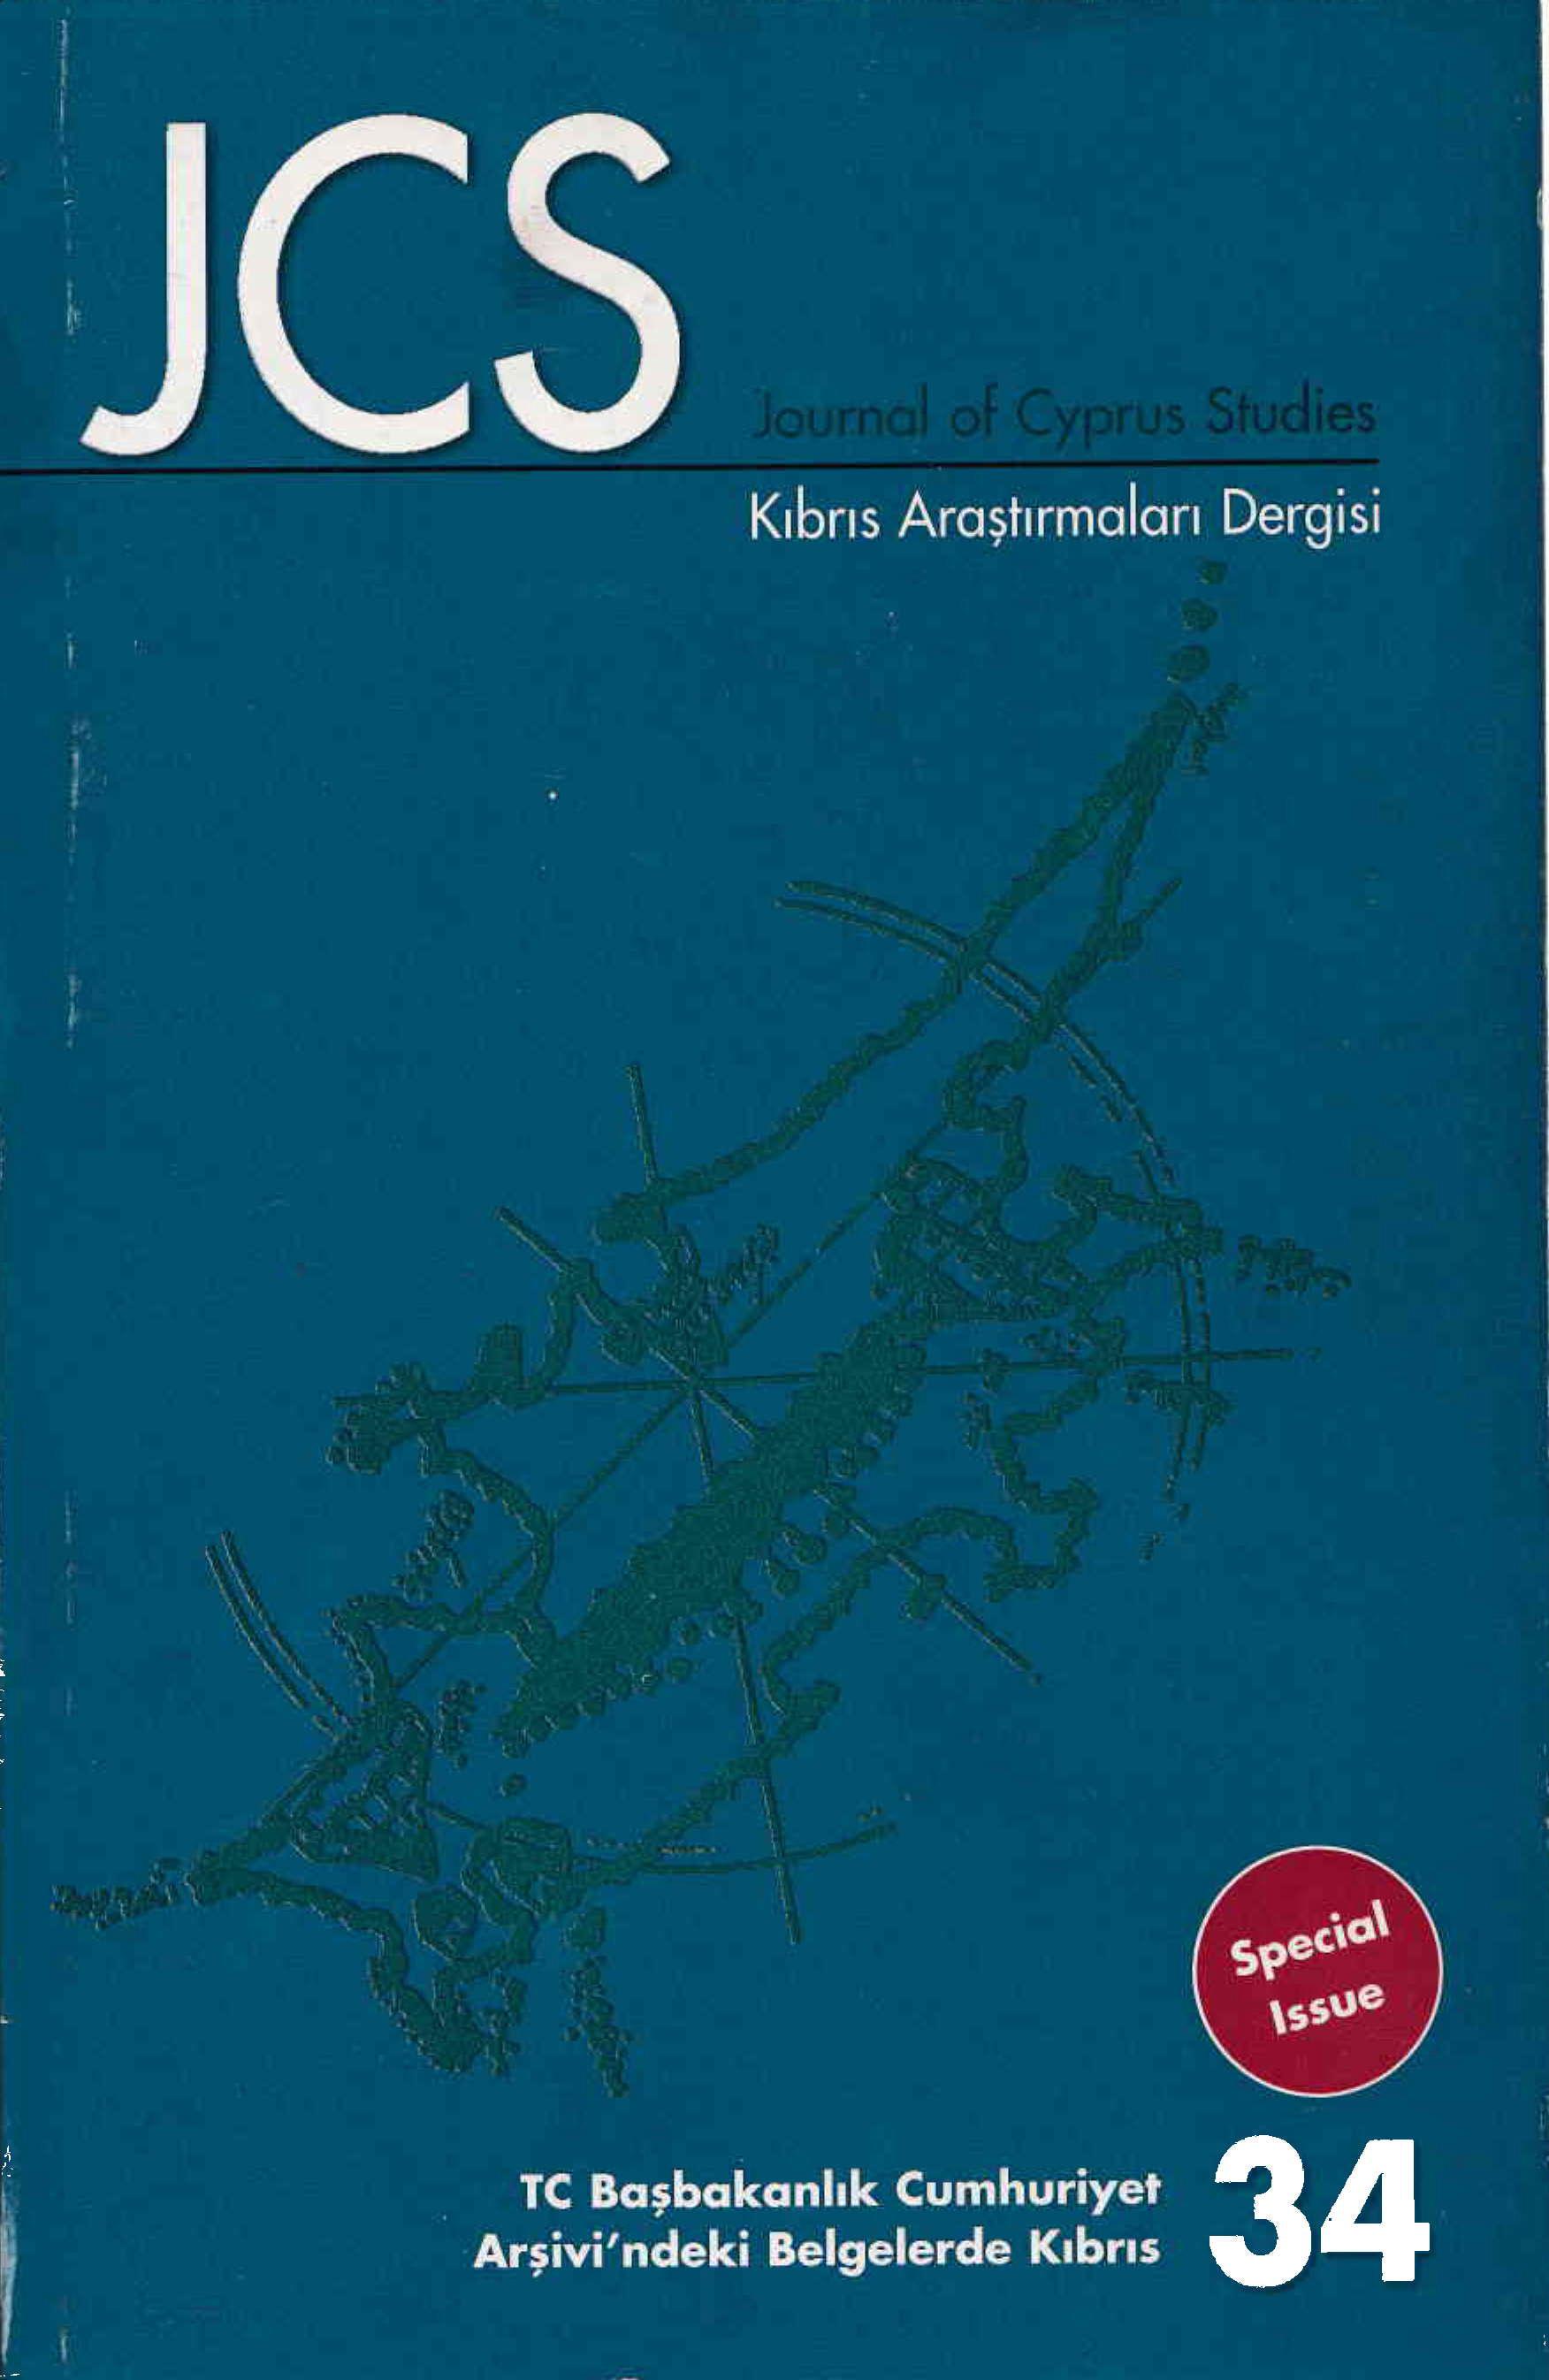 View Vol. 14 No. 34 (2008): Journal of Cyprus Studies